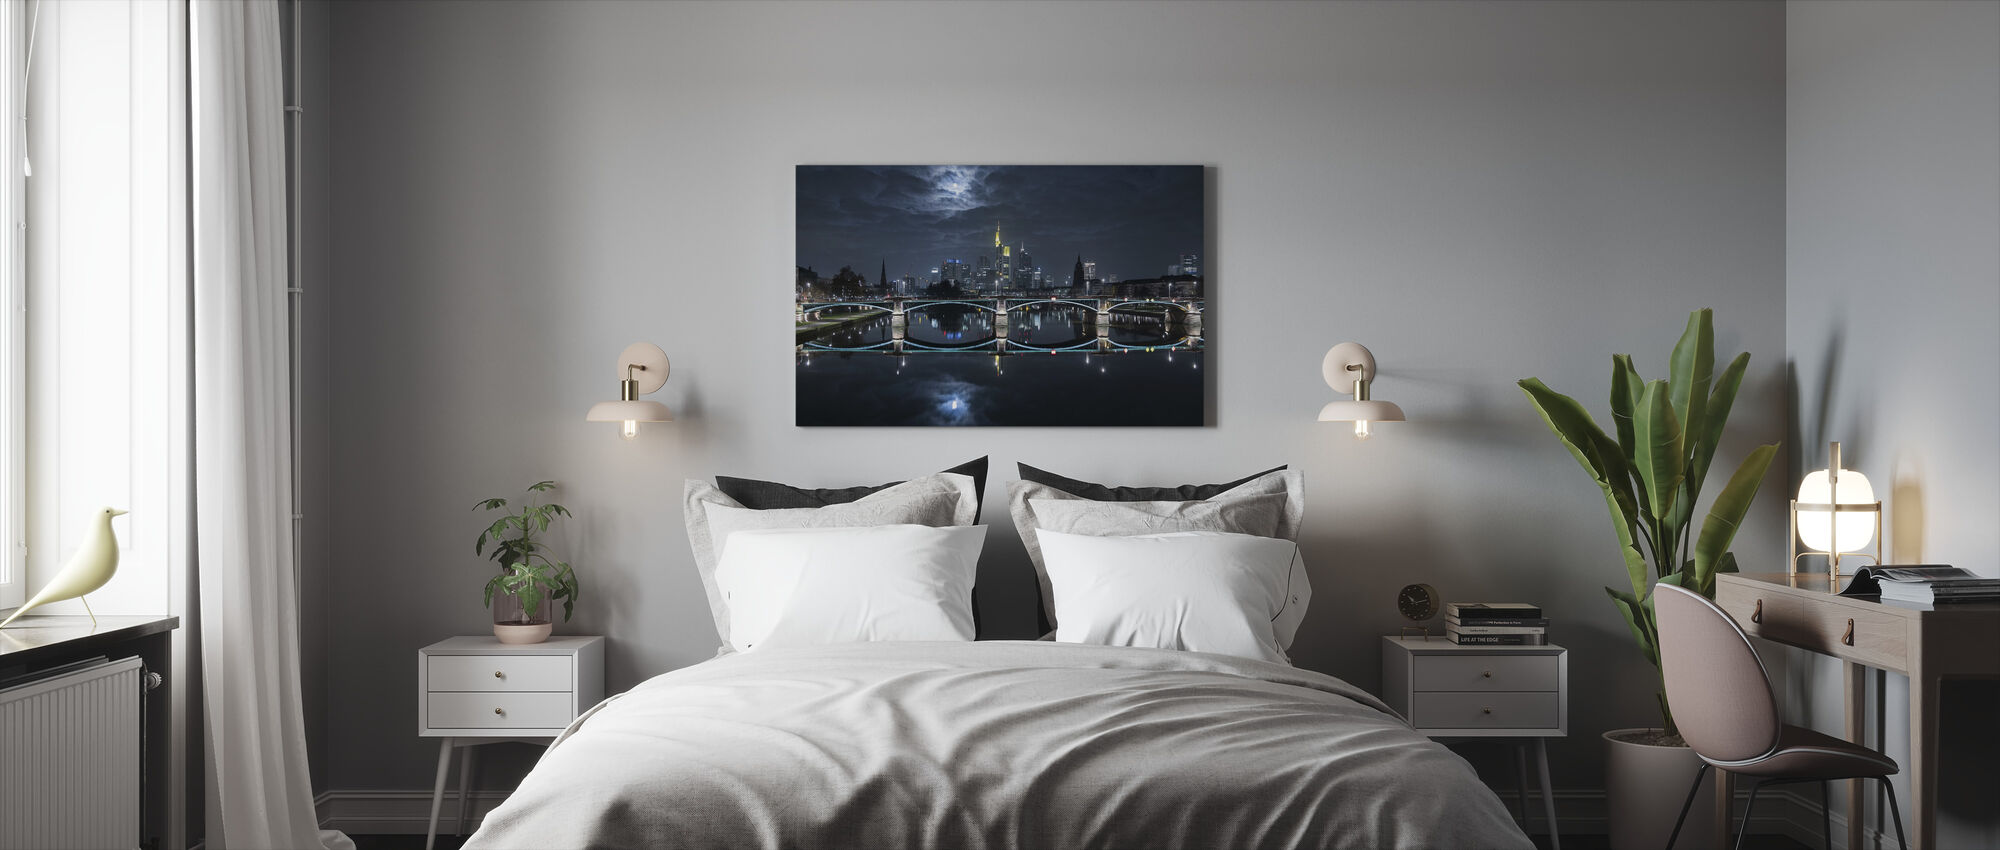 Frankfurt at Full Moon - Canvas print - Bedroom